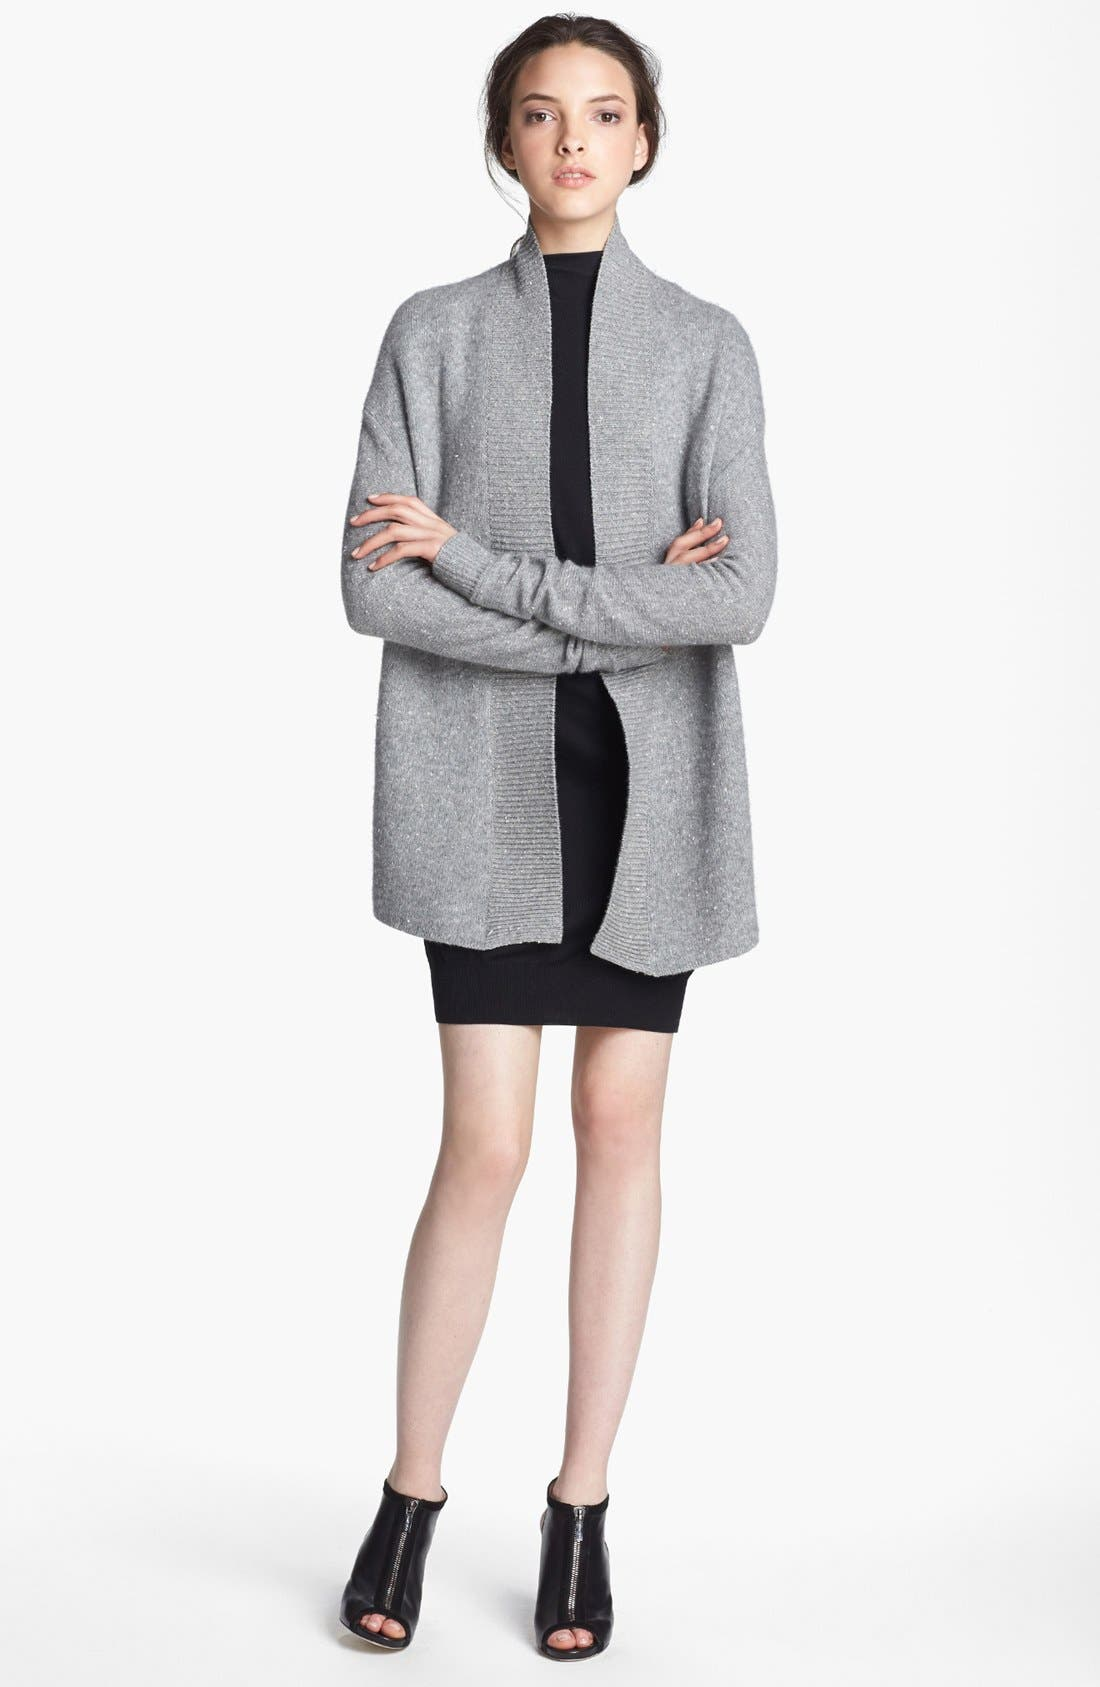 Main Image - Alexander Wang Donegal Tweed Knit Cardigan